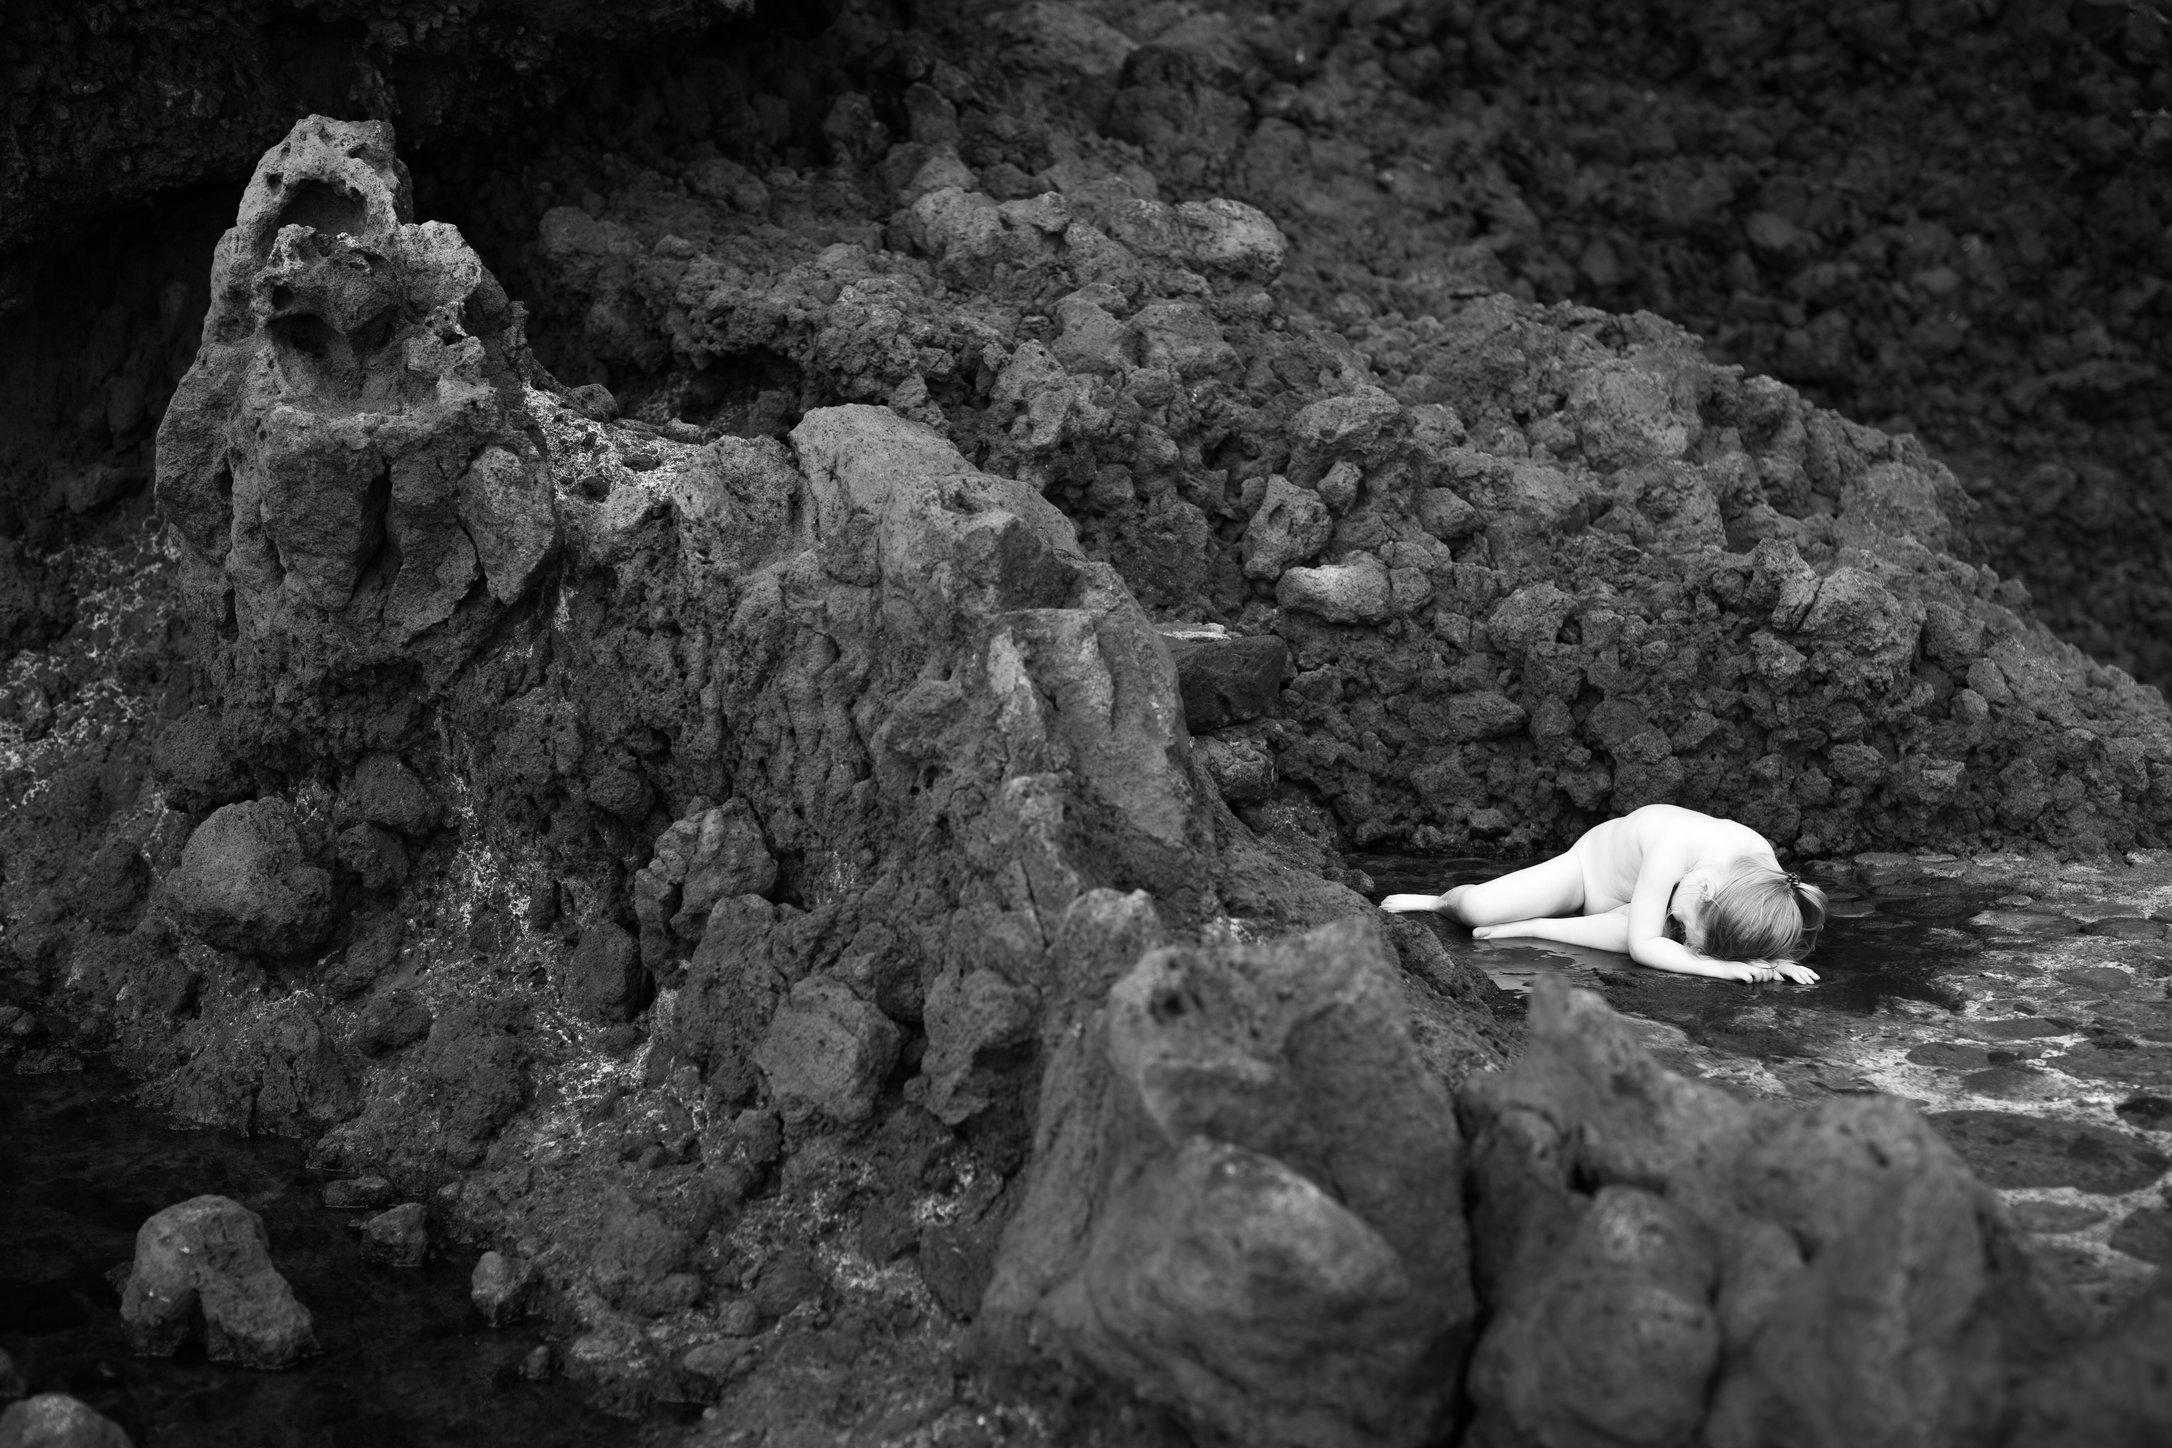 Portretfoto kind in lava poeltje - © Janneke Walter, kinderfotograaf omgeving Utrecht